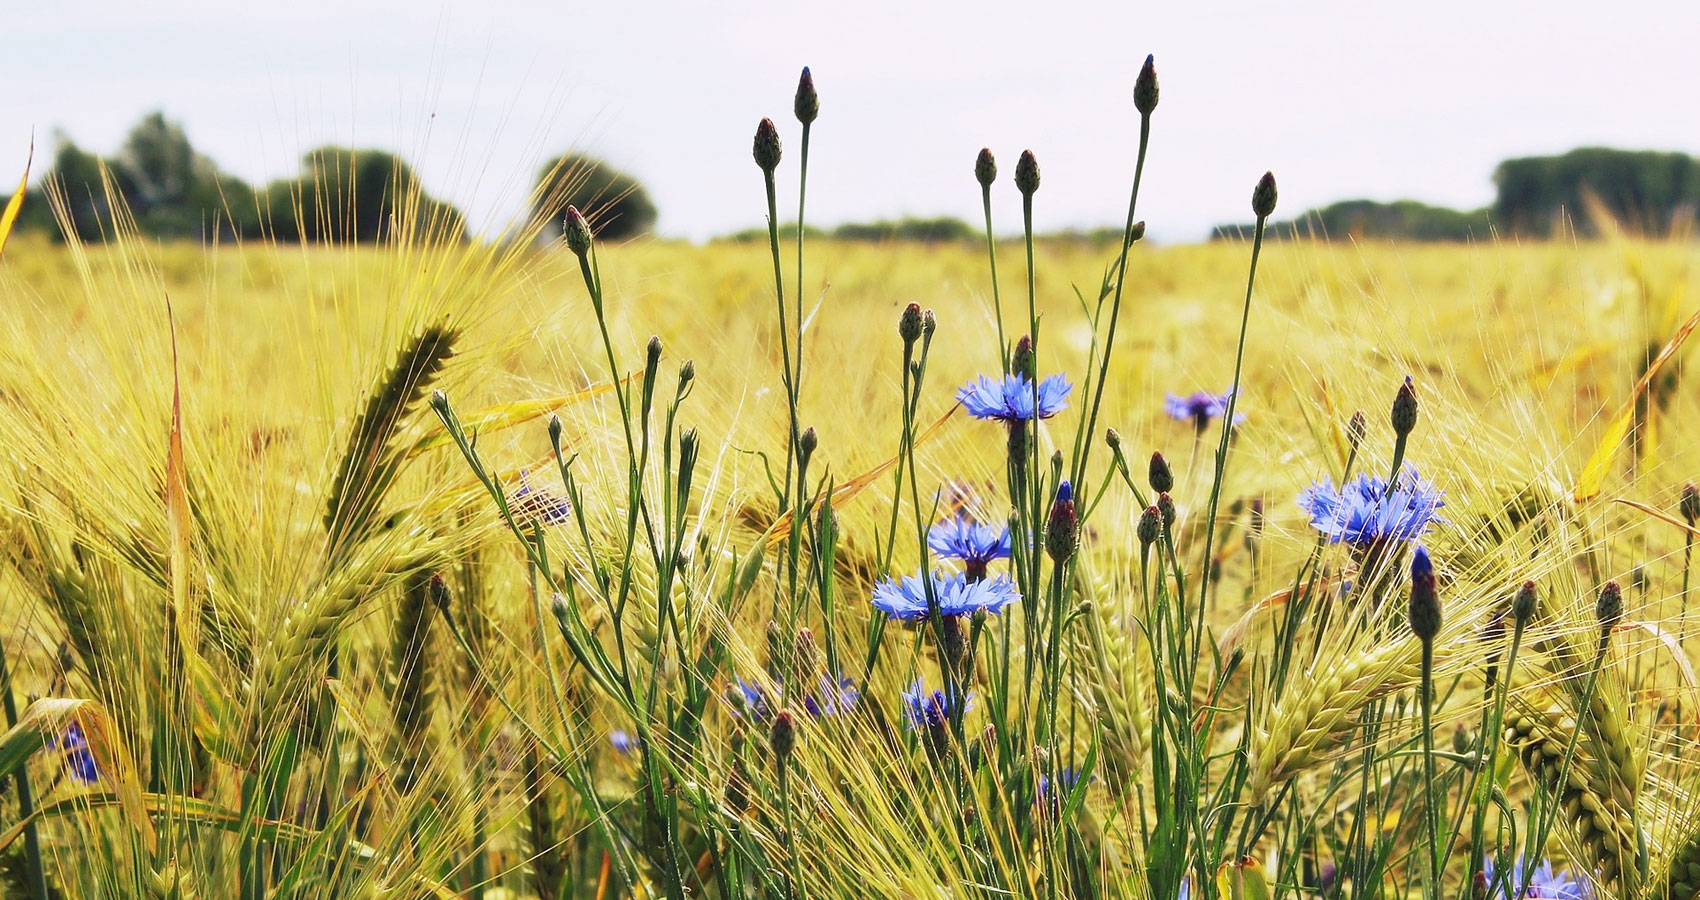 Flinders Field written by hedgehogat Spillwords.com